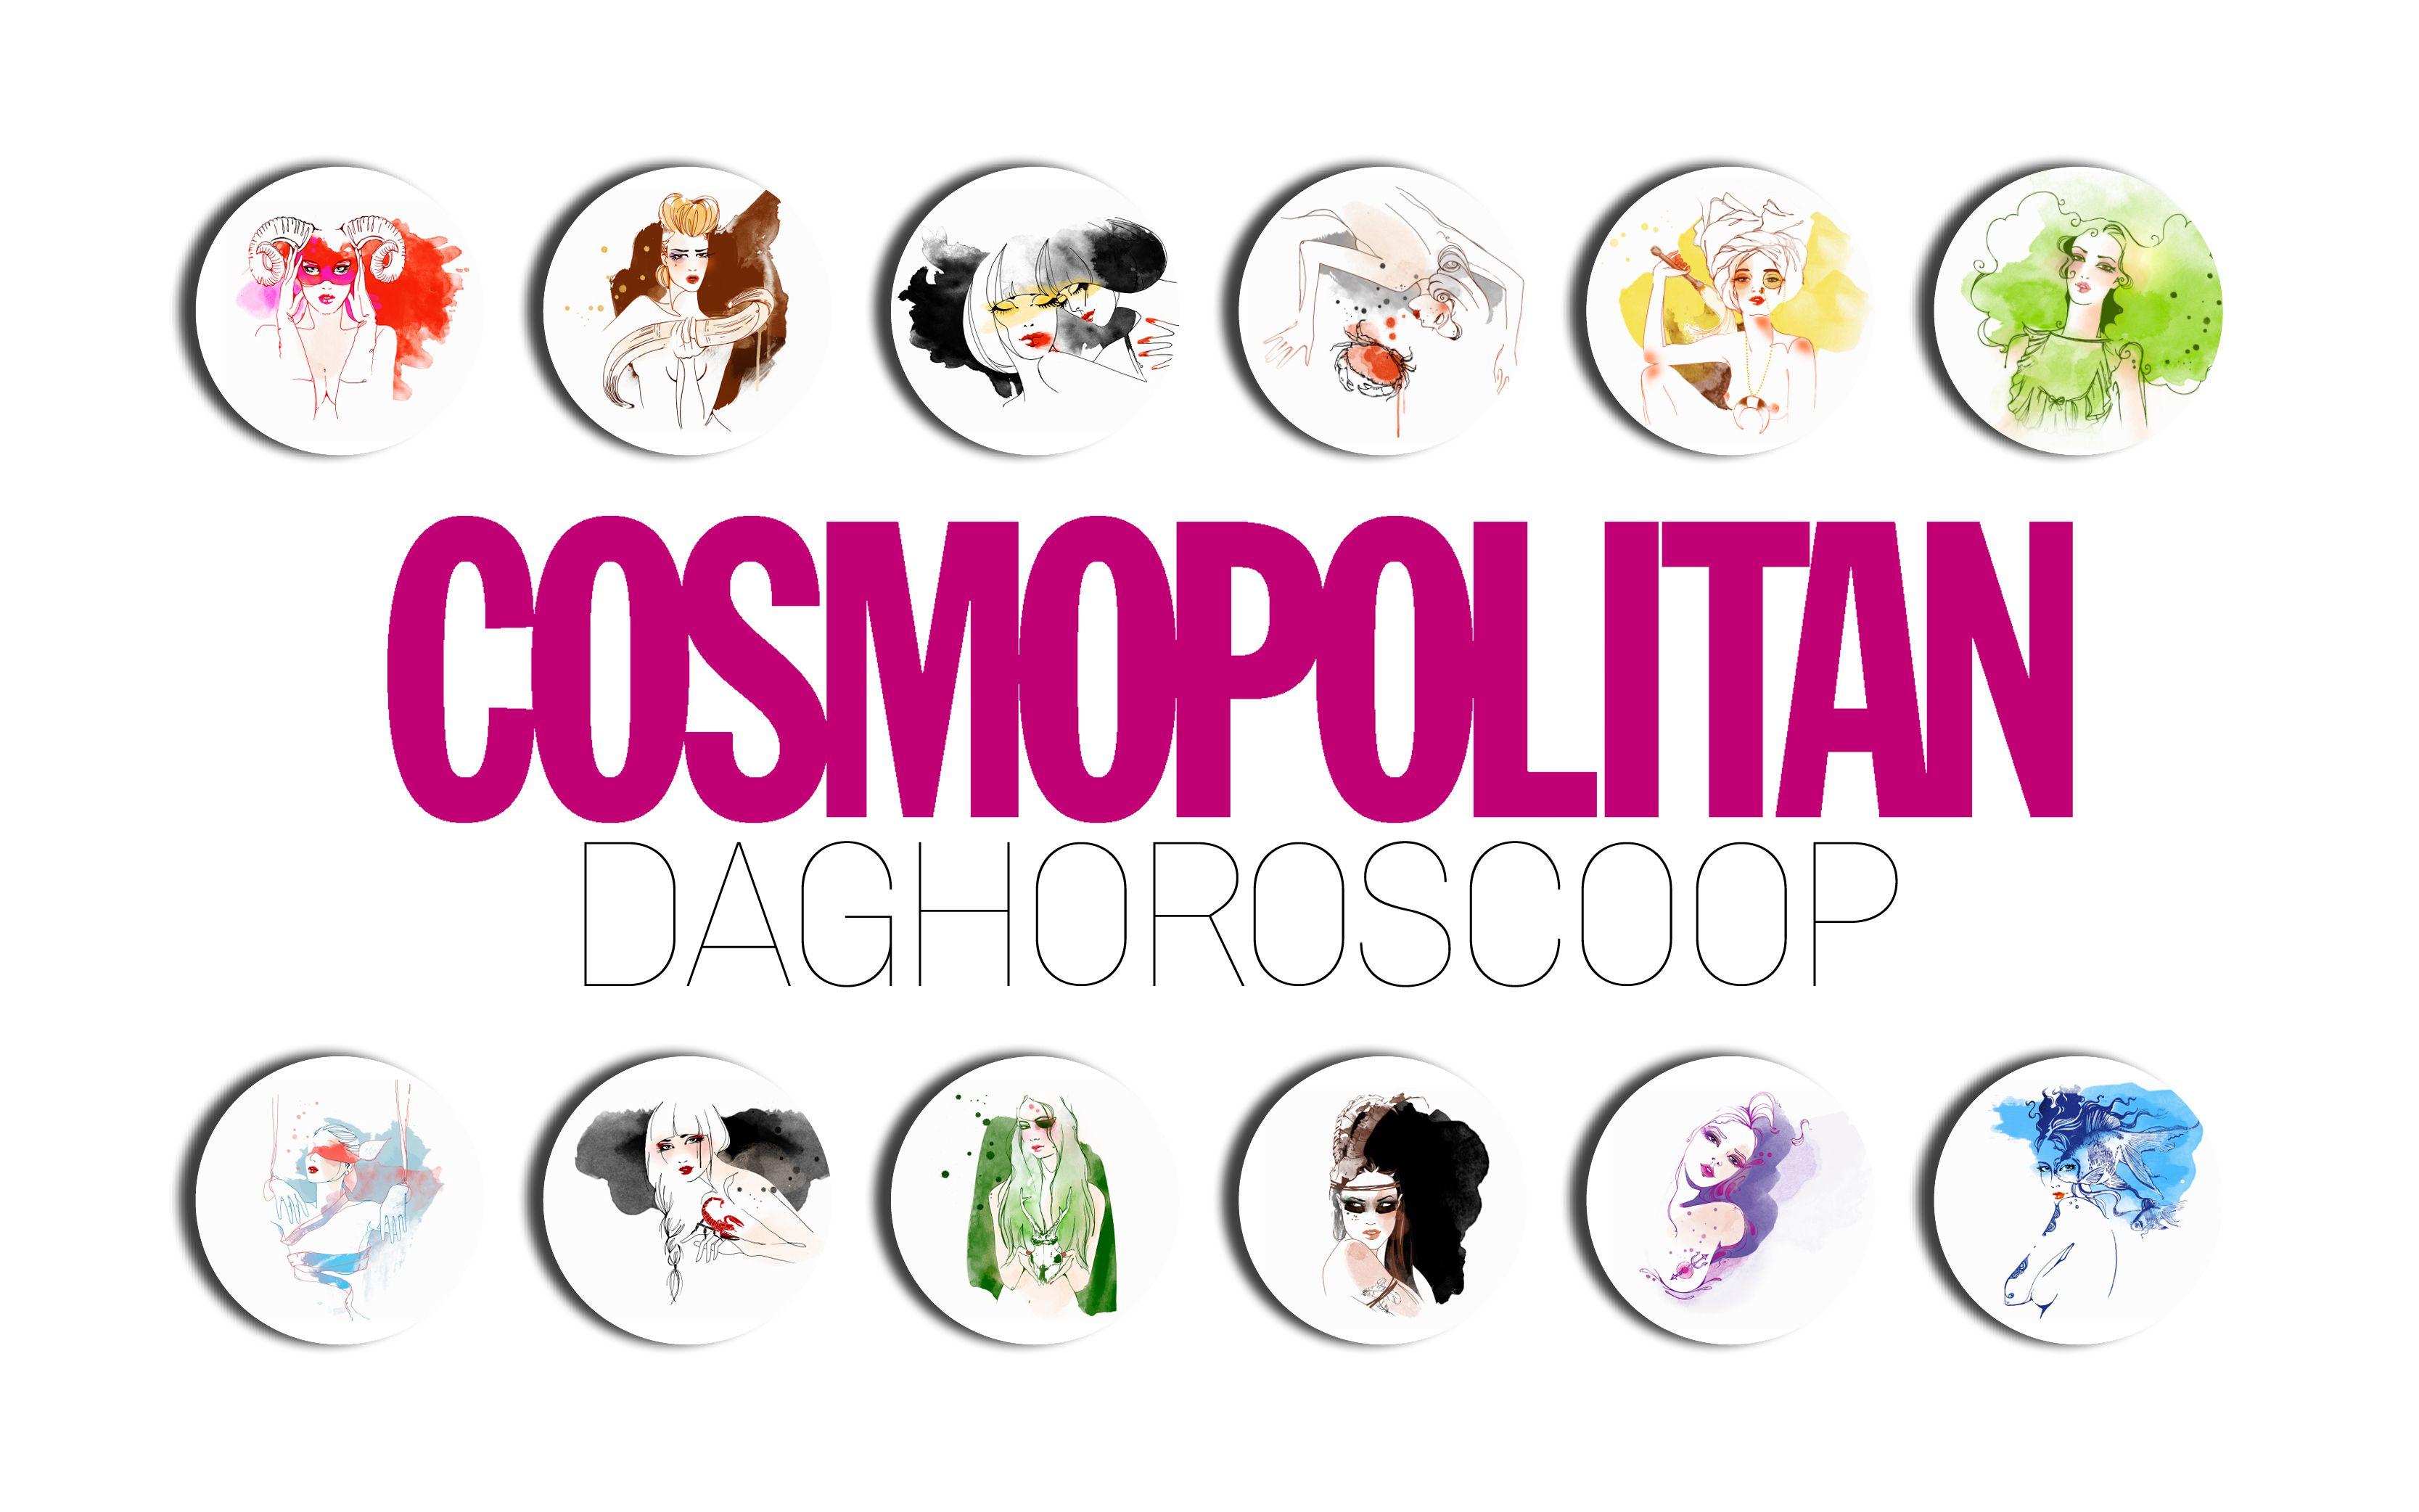 Horoscoop: vrijdag 16 november 2019 images